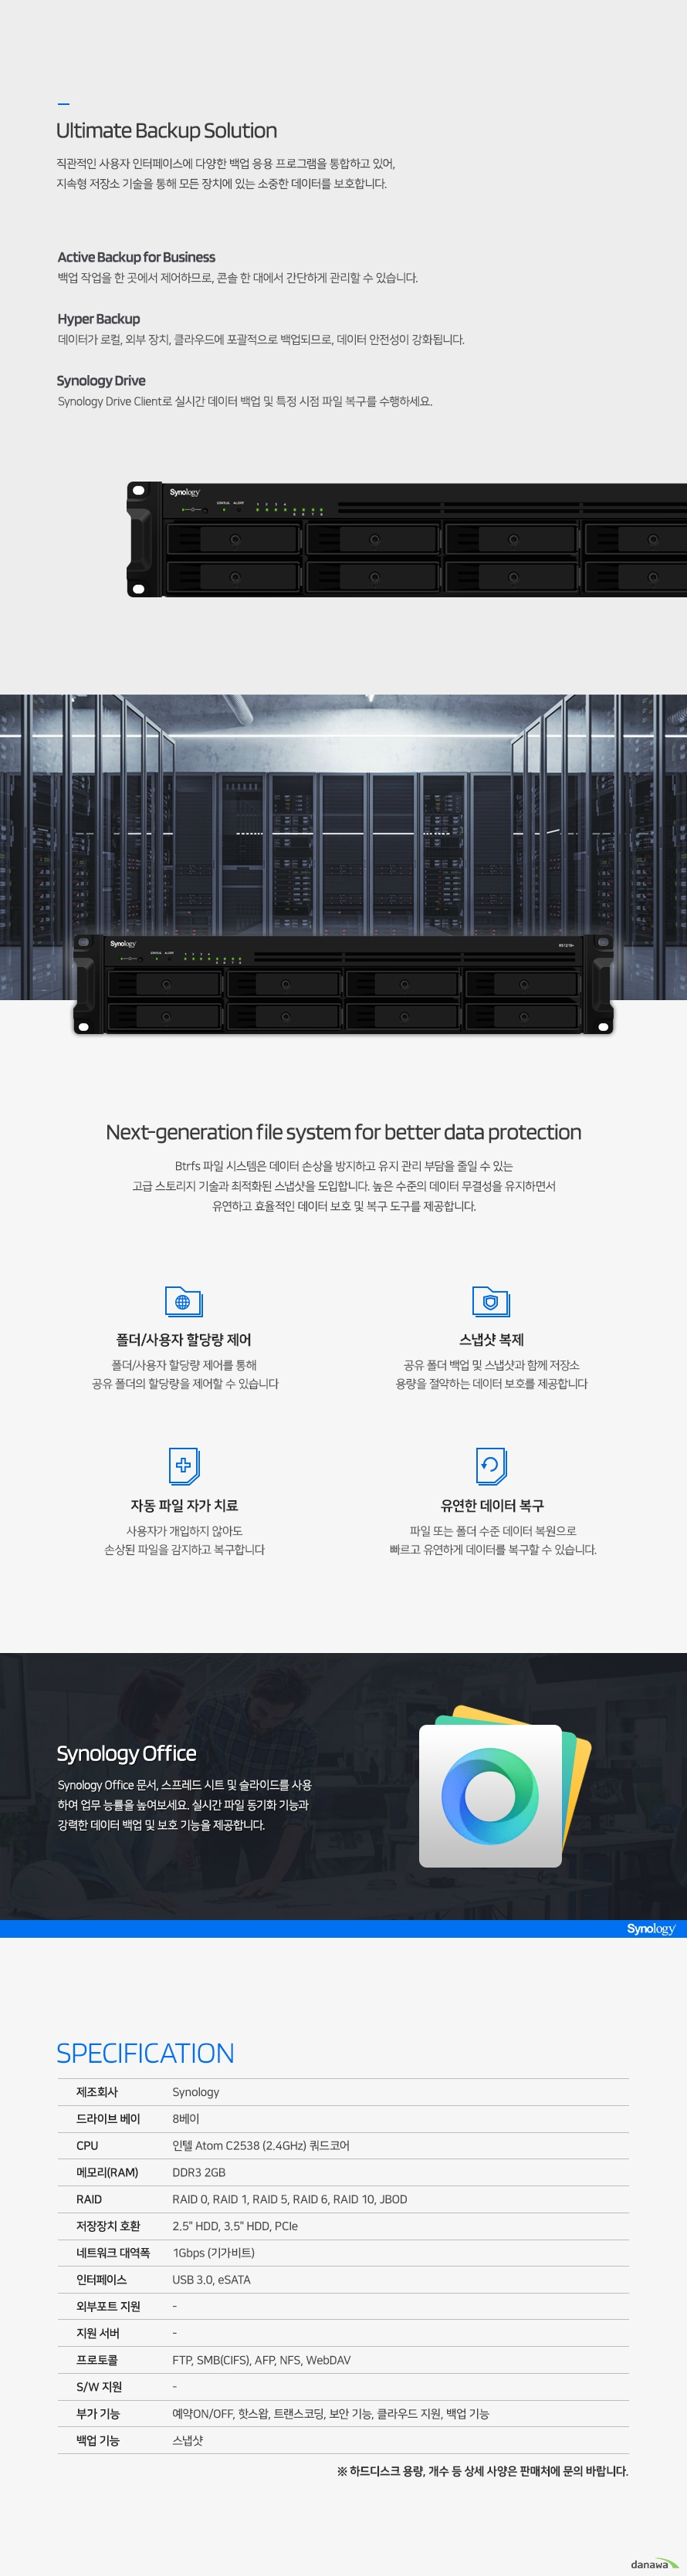 NAS Cloud Server RackStation RS1219+ RAM 2GB rackmount NAS for high-performance data management Synology DiskStation Manager (DSM) Synology가 개발한 웹 기반 운영체제인 DiskStation Manager (DSM)는 직관적인 인터페이스로 사용자가 더욱 편리하게 데이터를 관리할 수 있도록 도와줍니다. 서버가 항상 최상의 상태로 가동되도록 실시간으로 관리하며 철저한 이중 보안 기능으로 사용자의 귀중한 데이터를 보호하고 어떤 상황에서도 데이터를 보존할 수 있도록 강력한 백업 기능을 지원합니다. High-performance storage solution 효과적인 중앙 집중 데이터 관리를 추구하는 기업을 위해 설계되었습니다. 대용량 드라이브 트레이와 기가비트 LAN 포트 장착으로 데이터를 빠르게 전송하여 I/O 대기 시간을 줄였습니다. CPU 인텔 Atom C2538 2.4GHz 쿼드코어 Memory DDR3 2GB Network 1Gbps 기가비트 이더넷 Scalability 2.5